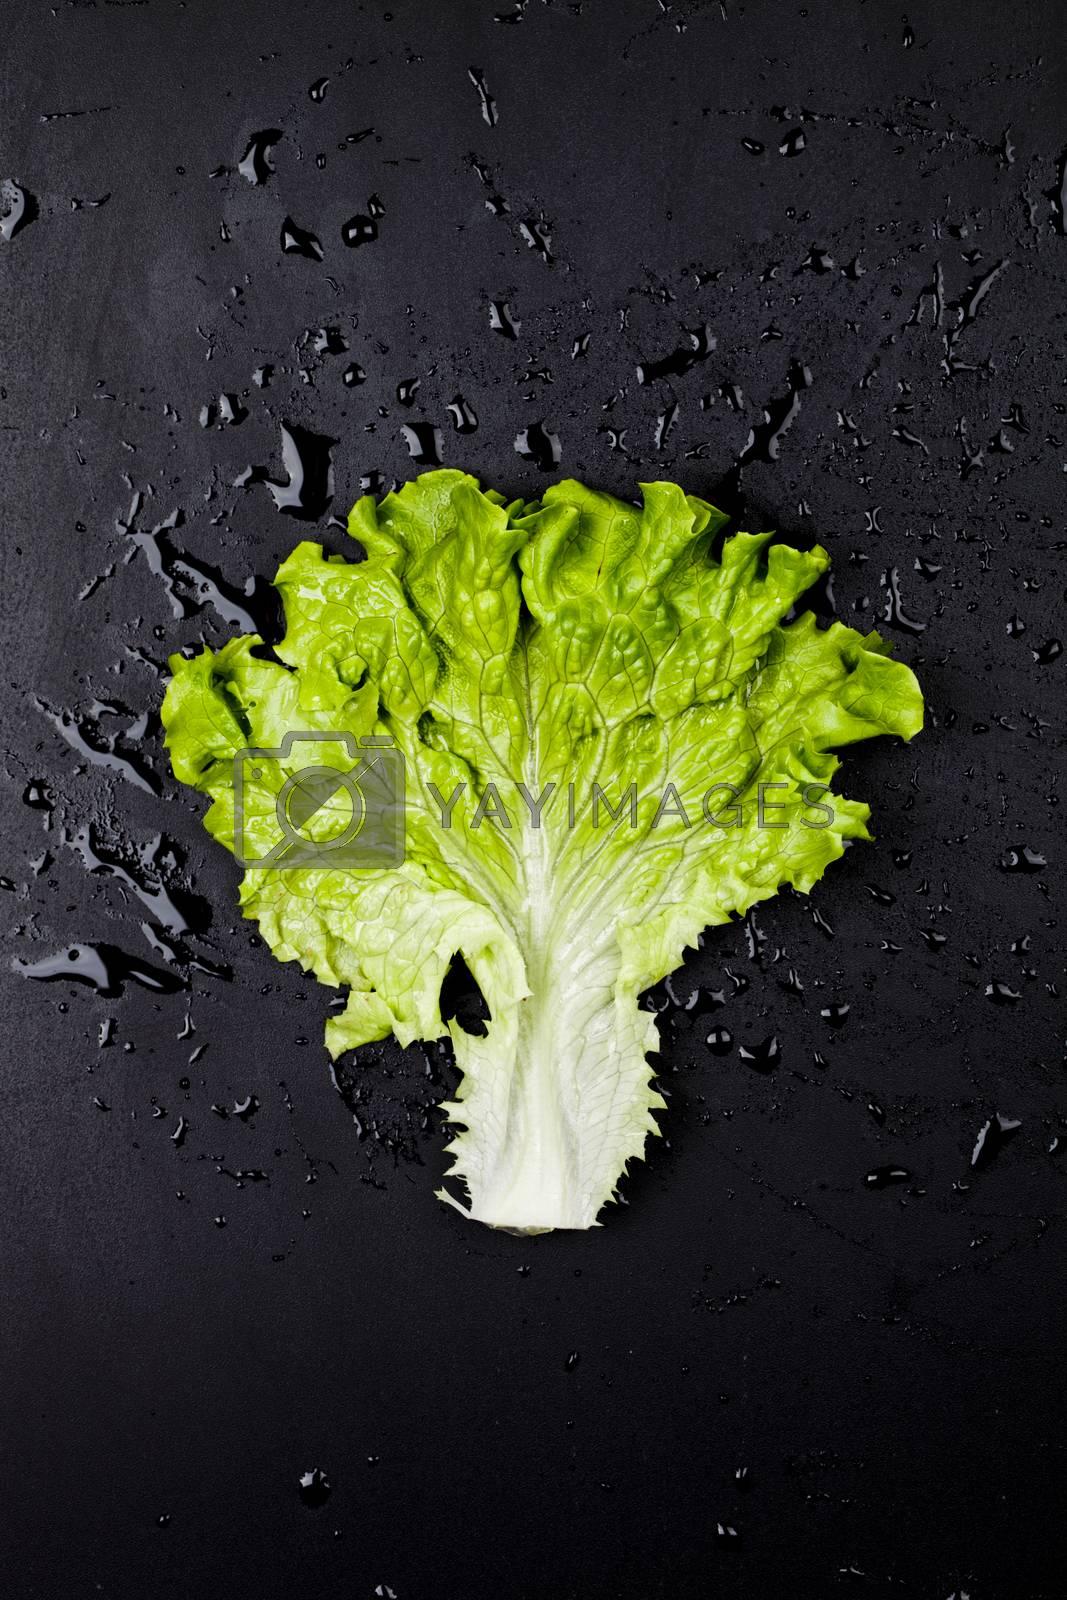 Green organic lettuce salad leaf on black wet background. Top view on black background.